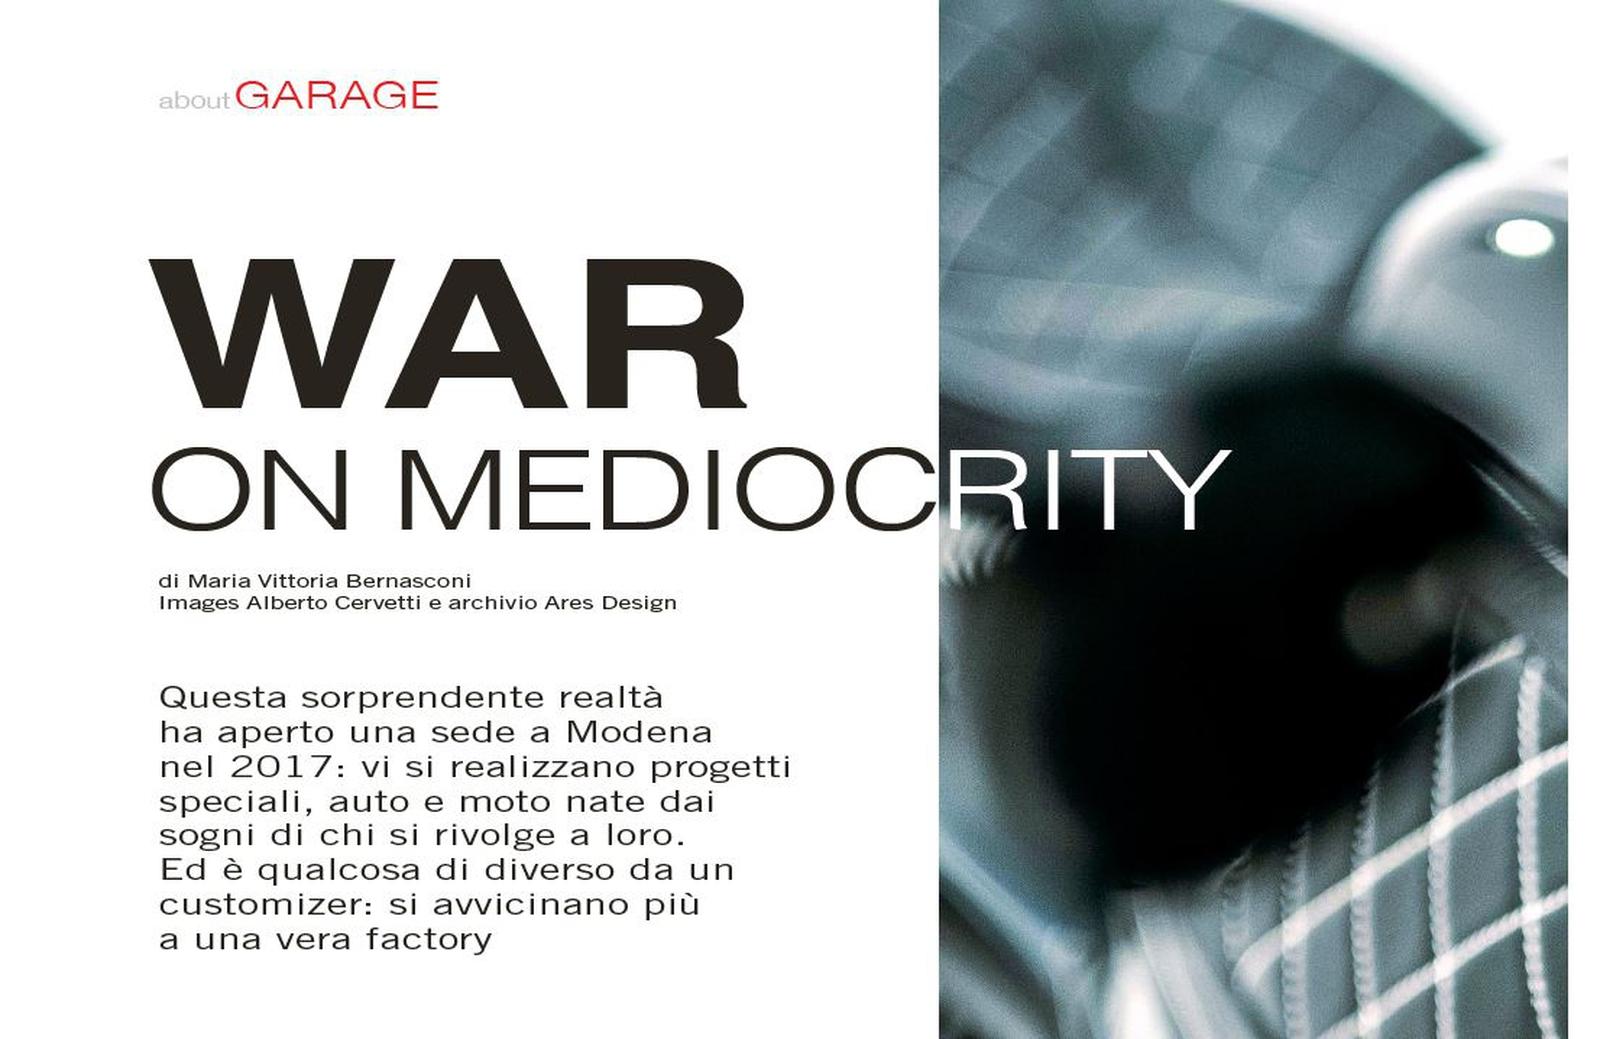 war on mediocrity